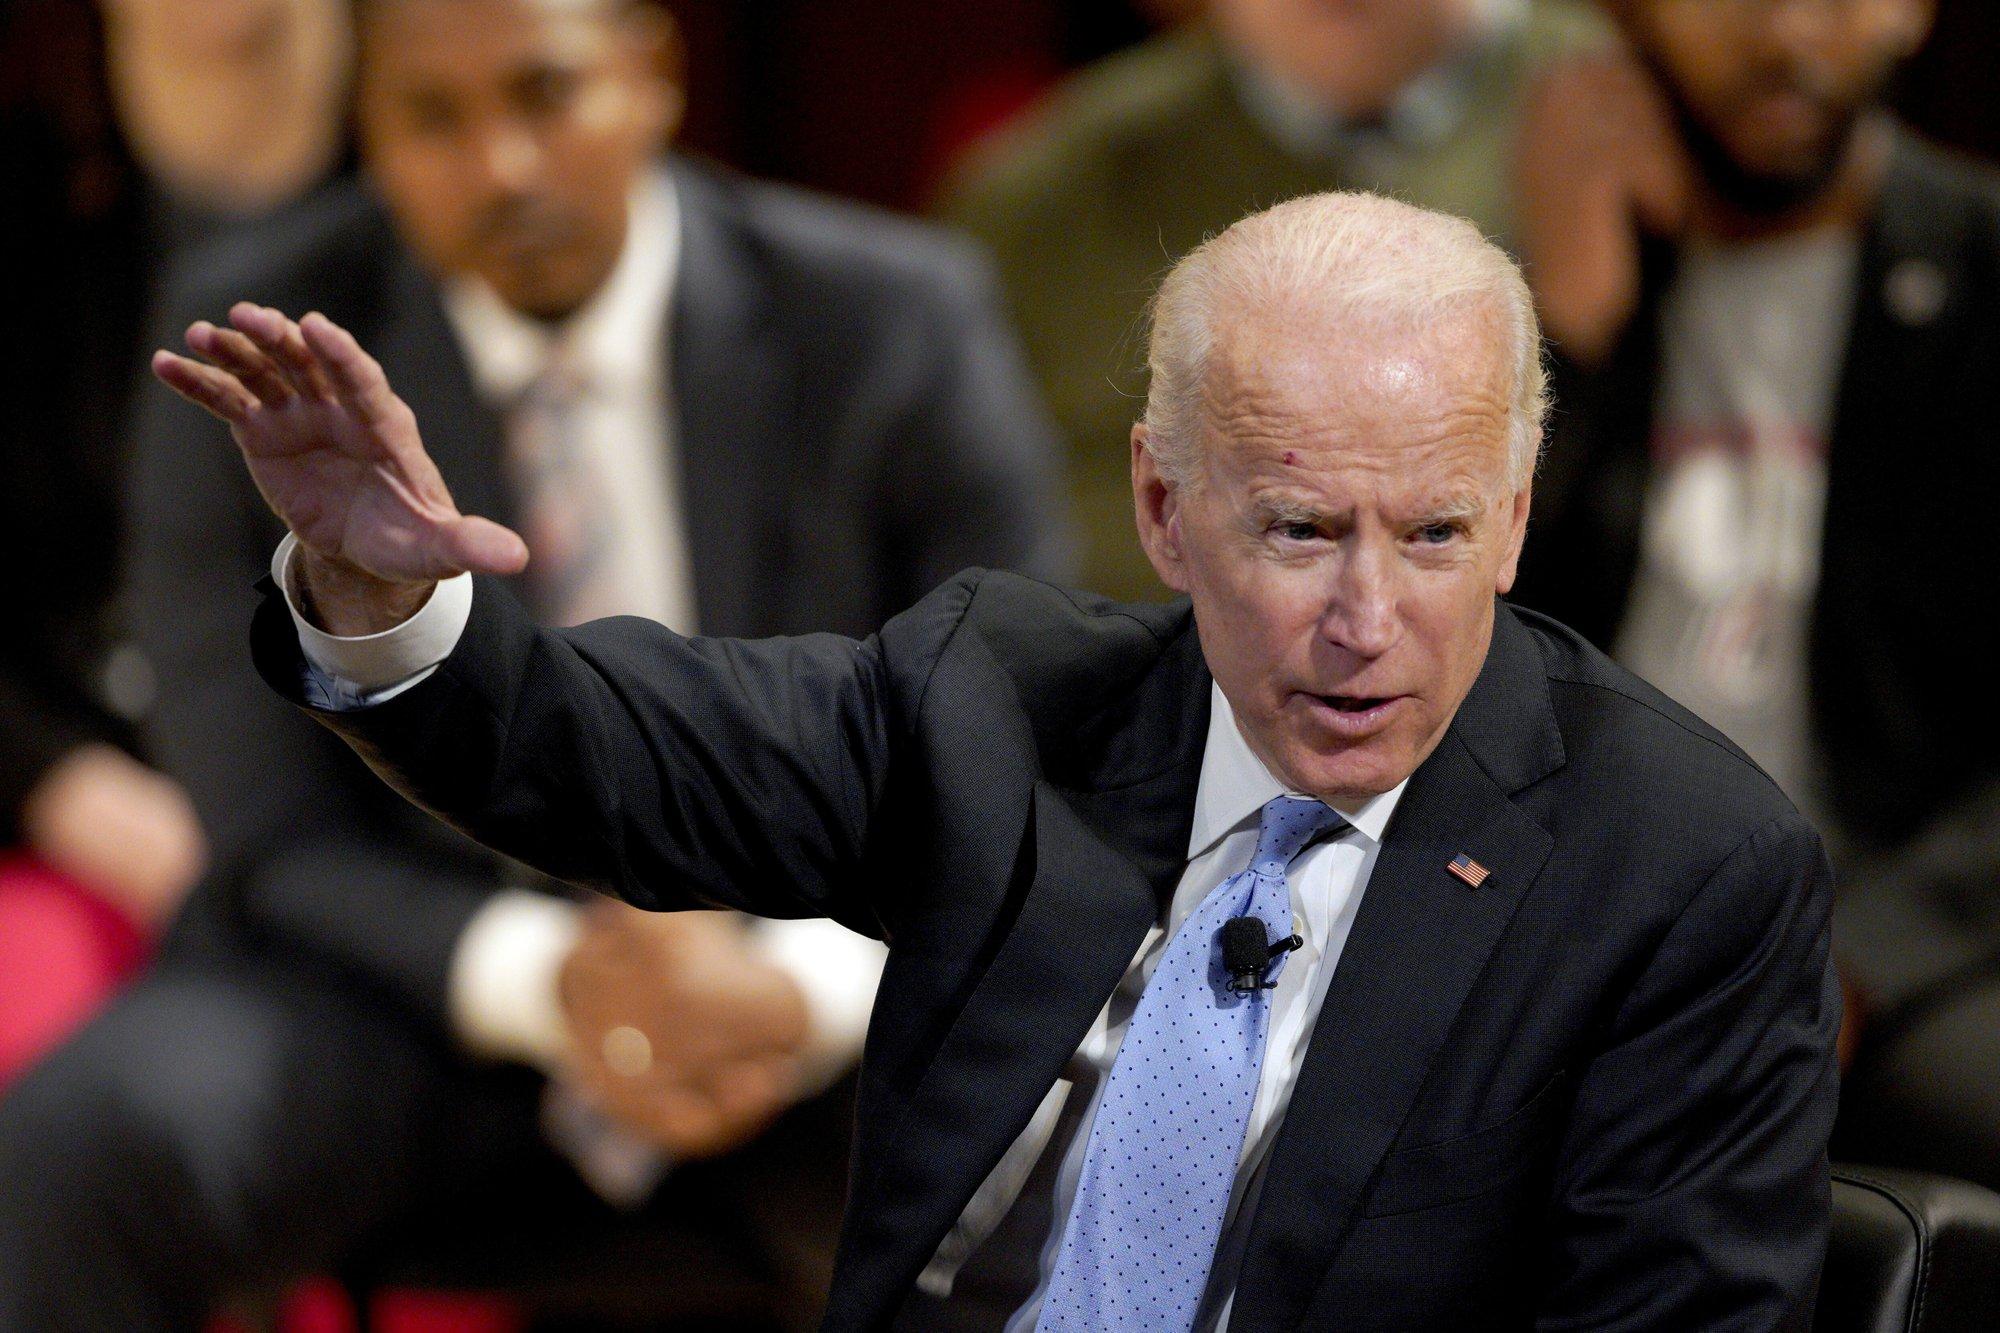 Biden eyes fundraising challenge amid new sense of urgency